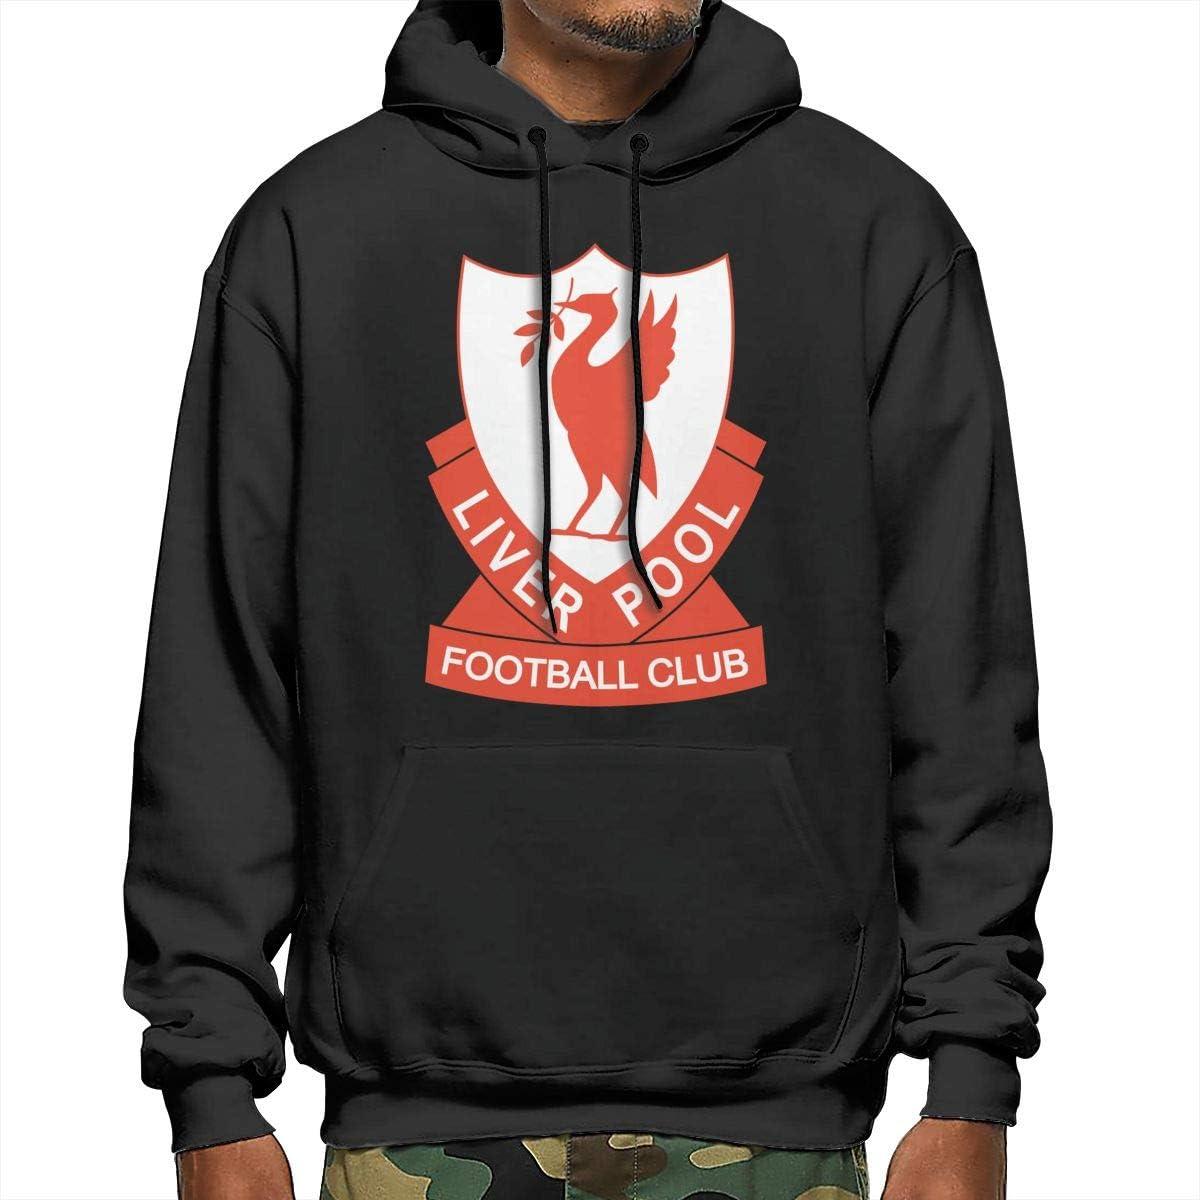 Takeyia Mens Liverpool-Fc Hoodies Wild for Adult Man Hooded Sweater Black Hoodies